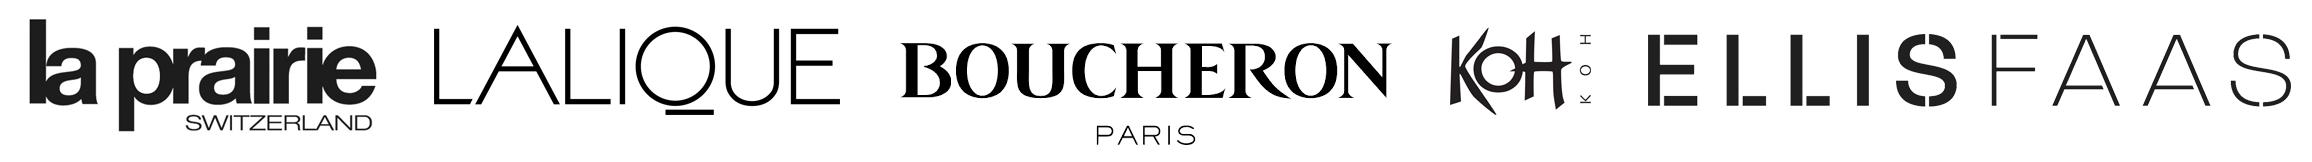 Merken-van-Partout-Parfumerie